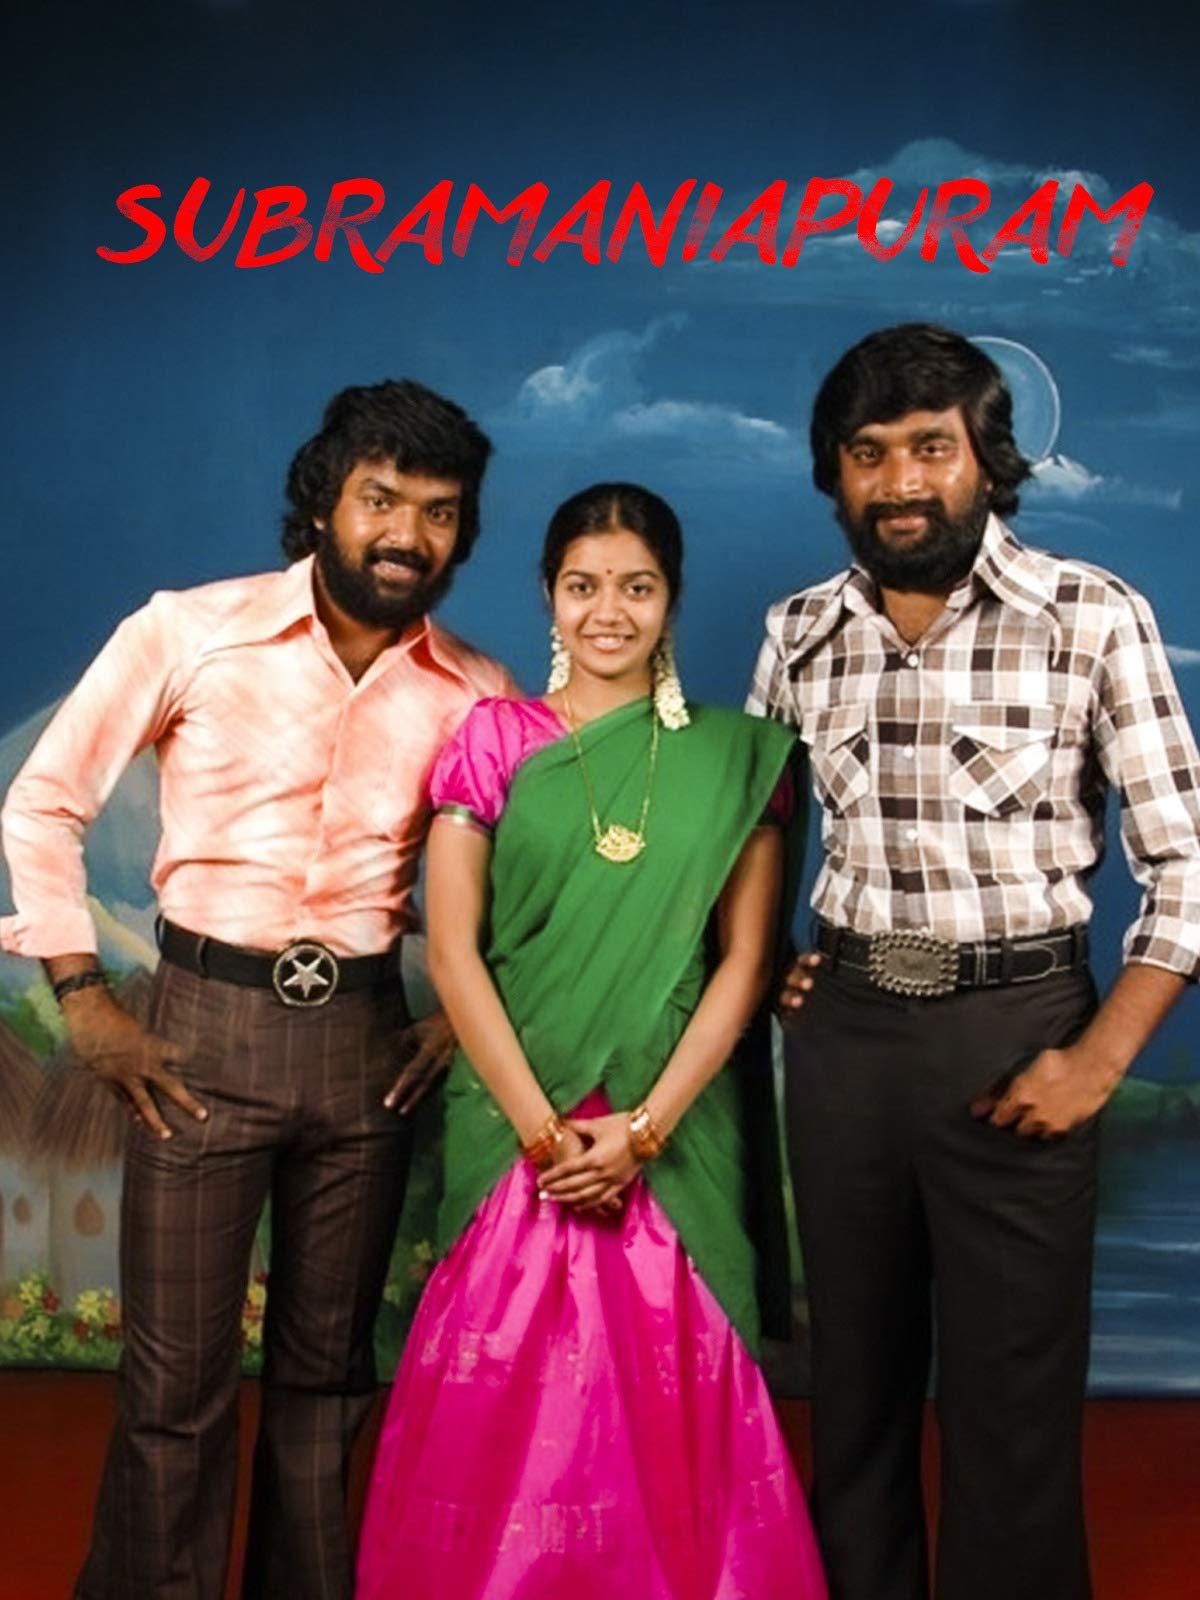 Subramaniapuram